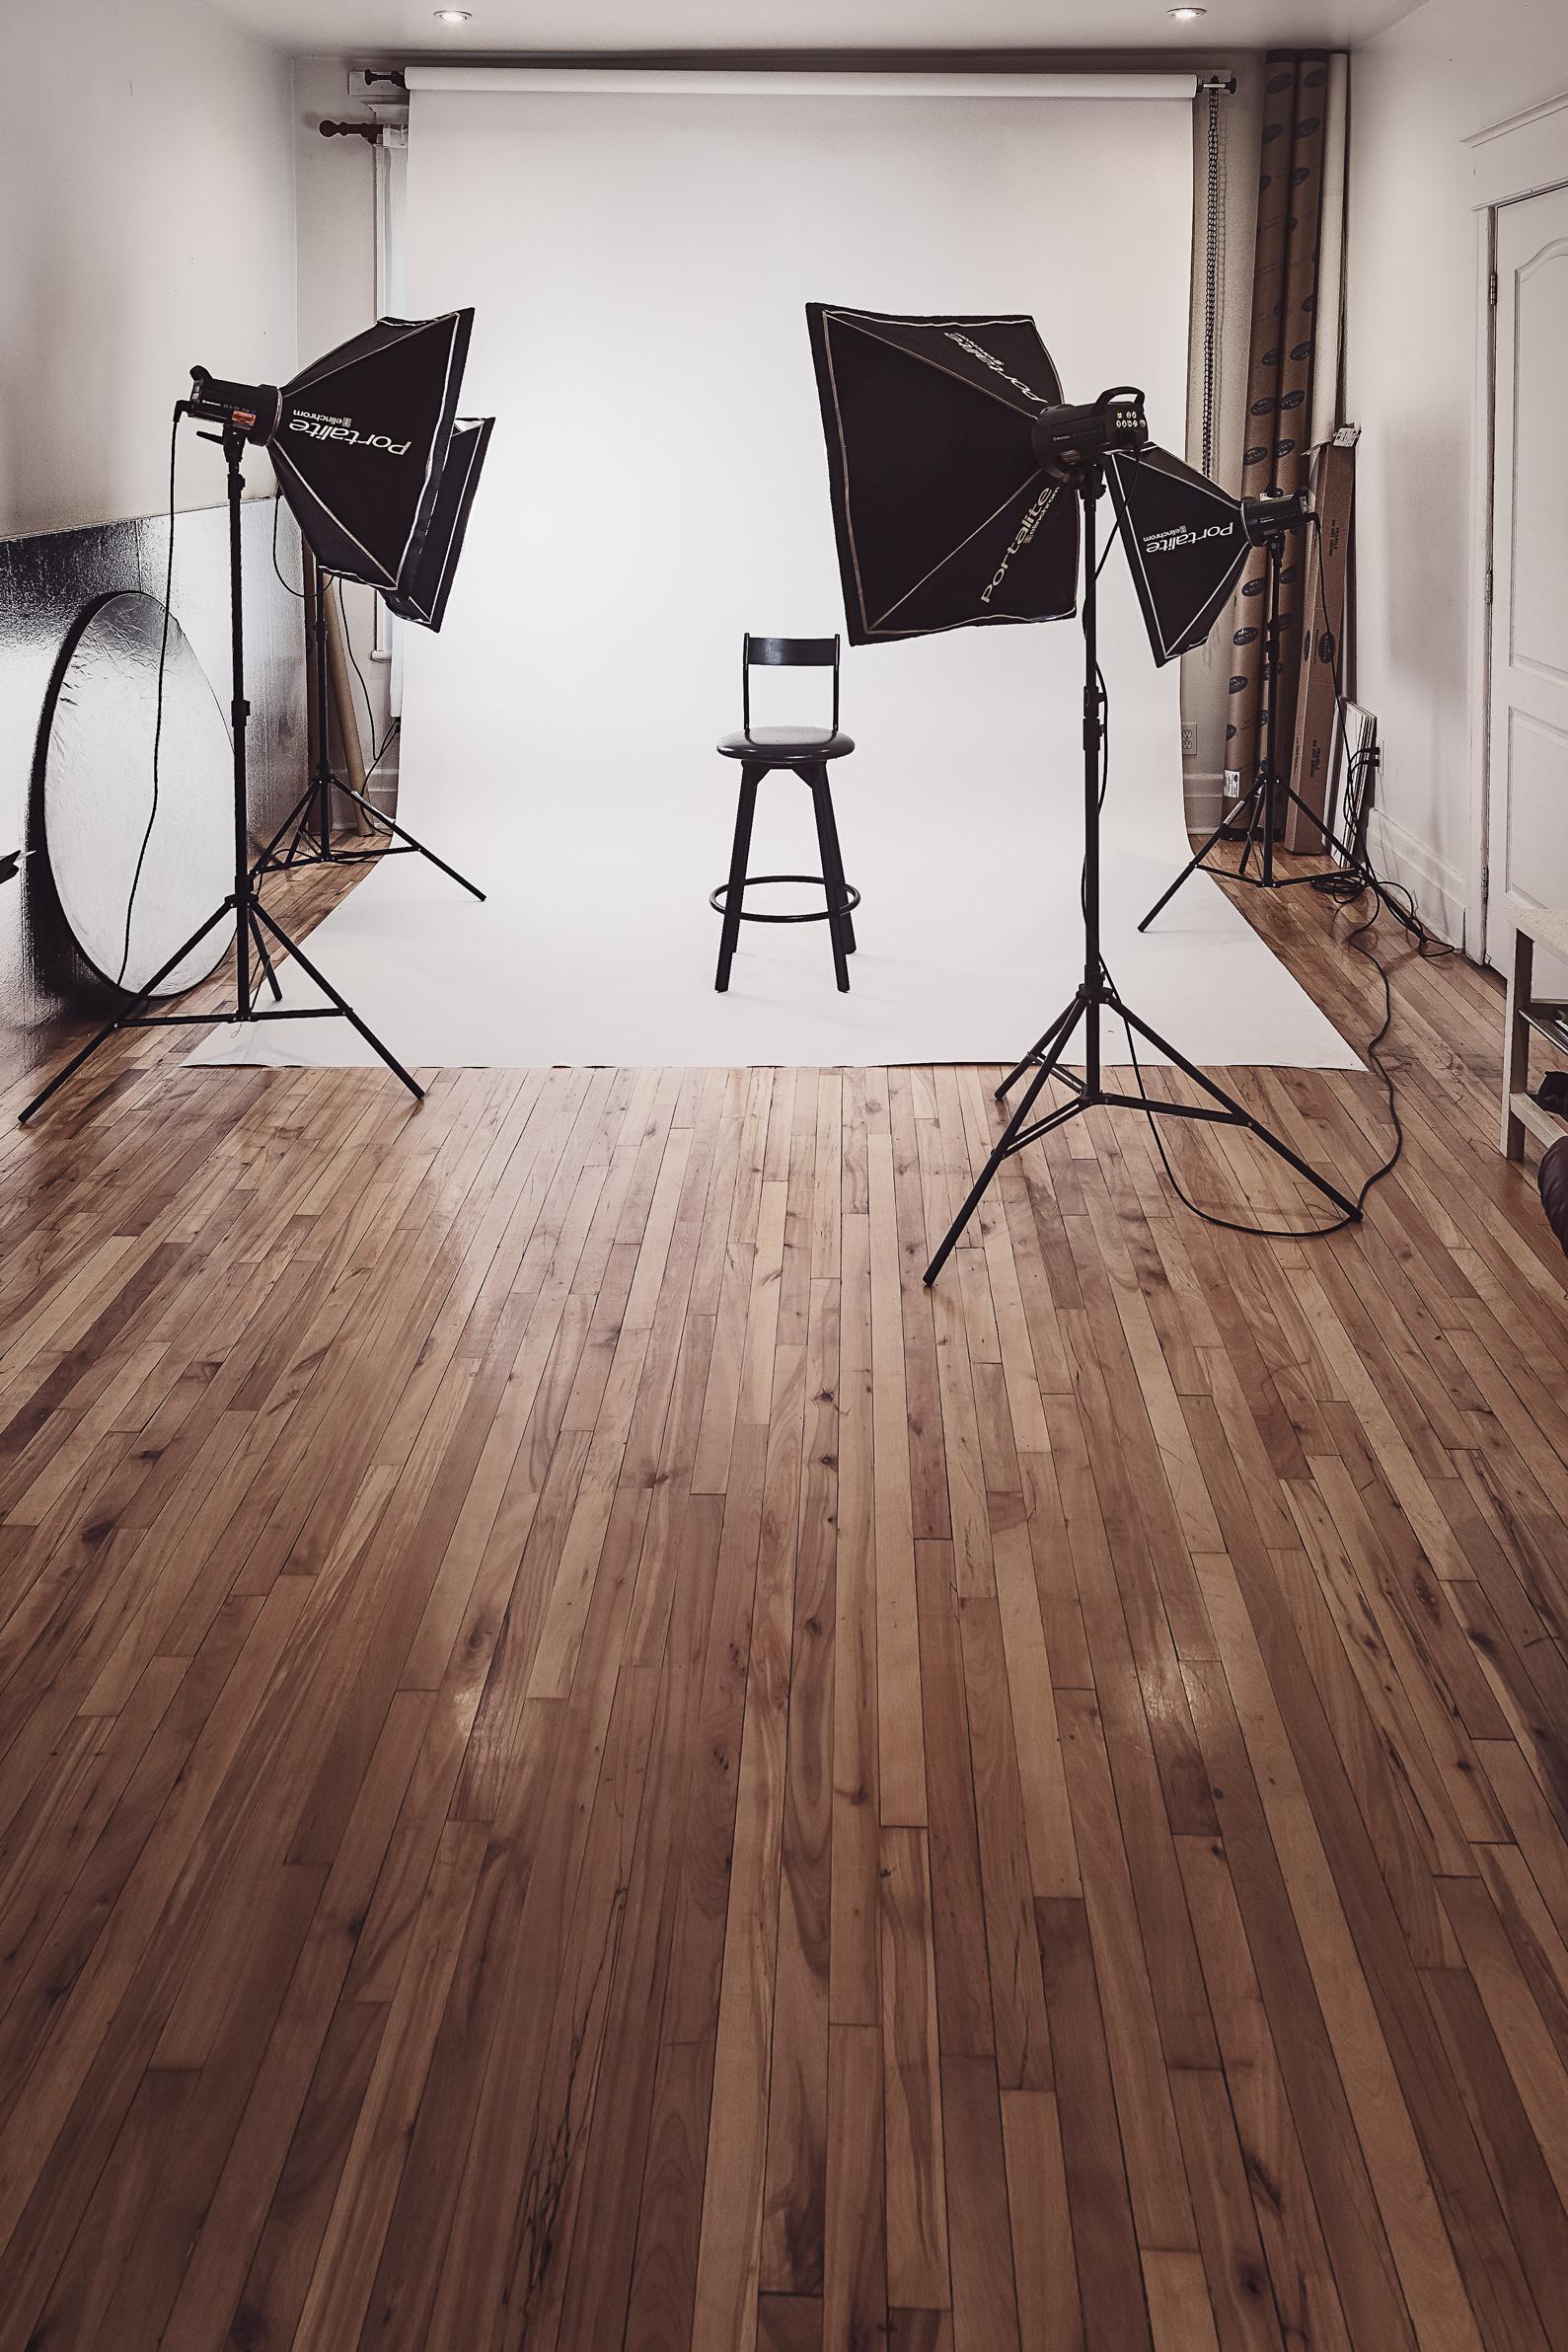 Tora-Photography---Montreal-Photography-Studio-02.jpg